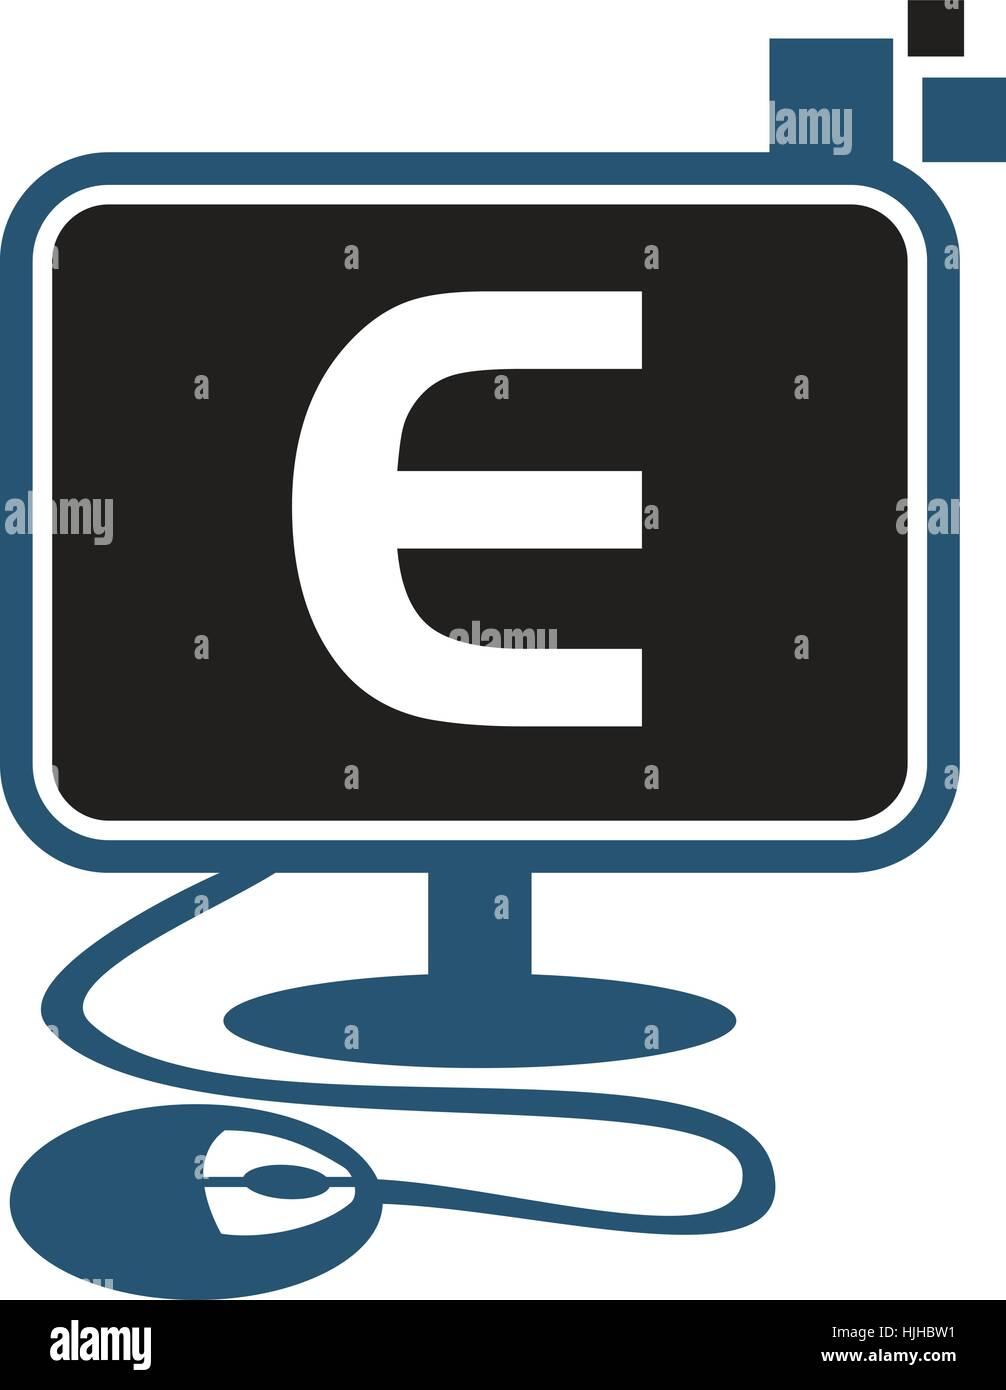 Digital Technology Initial E - Stock Image